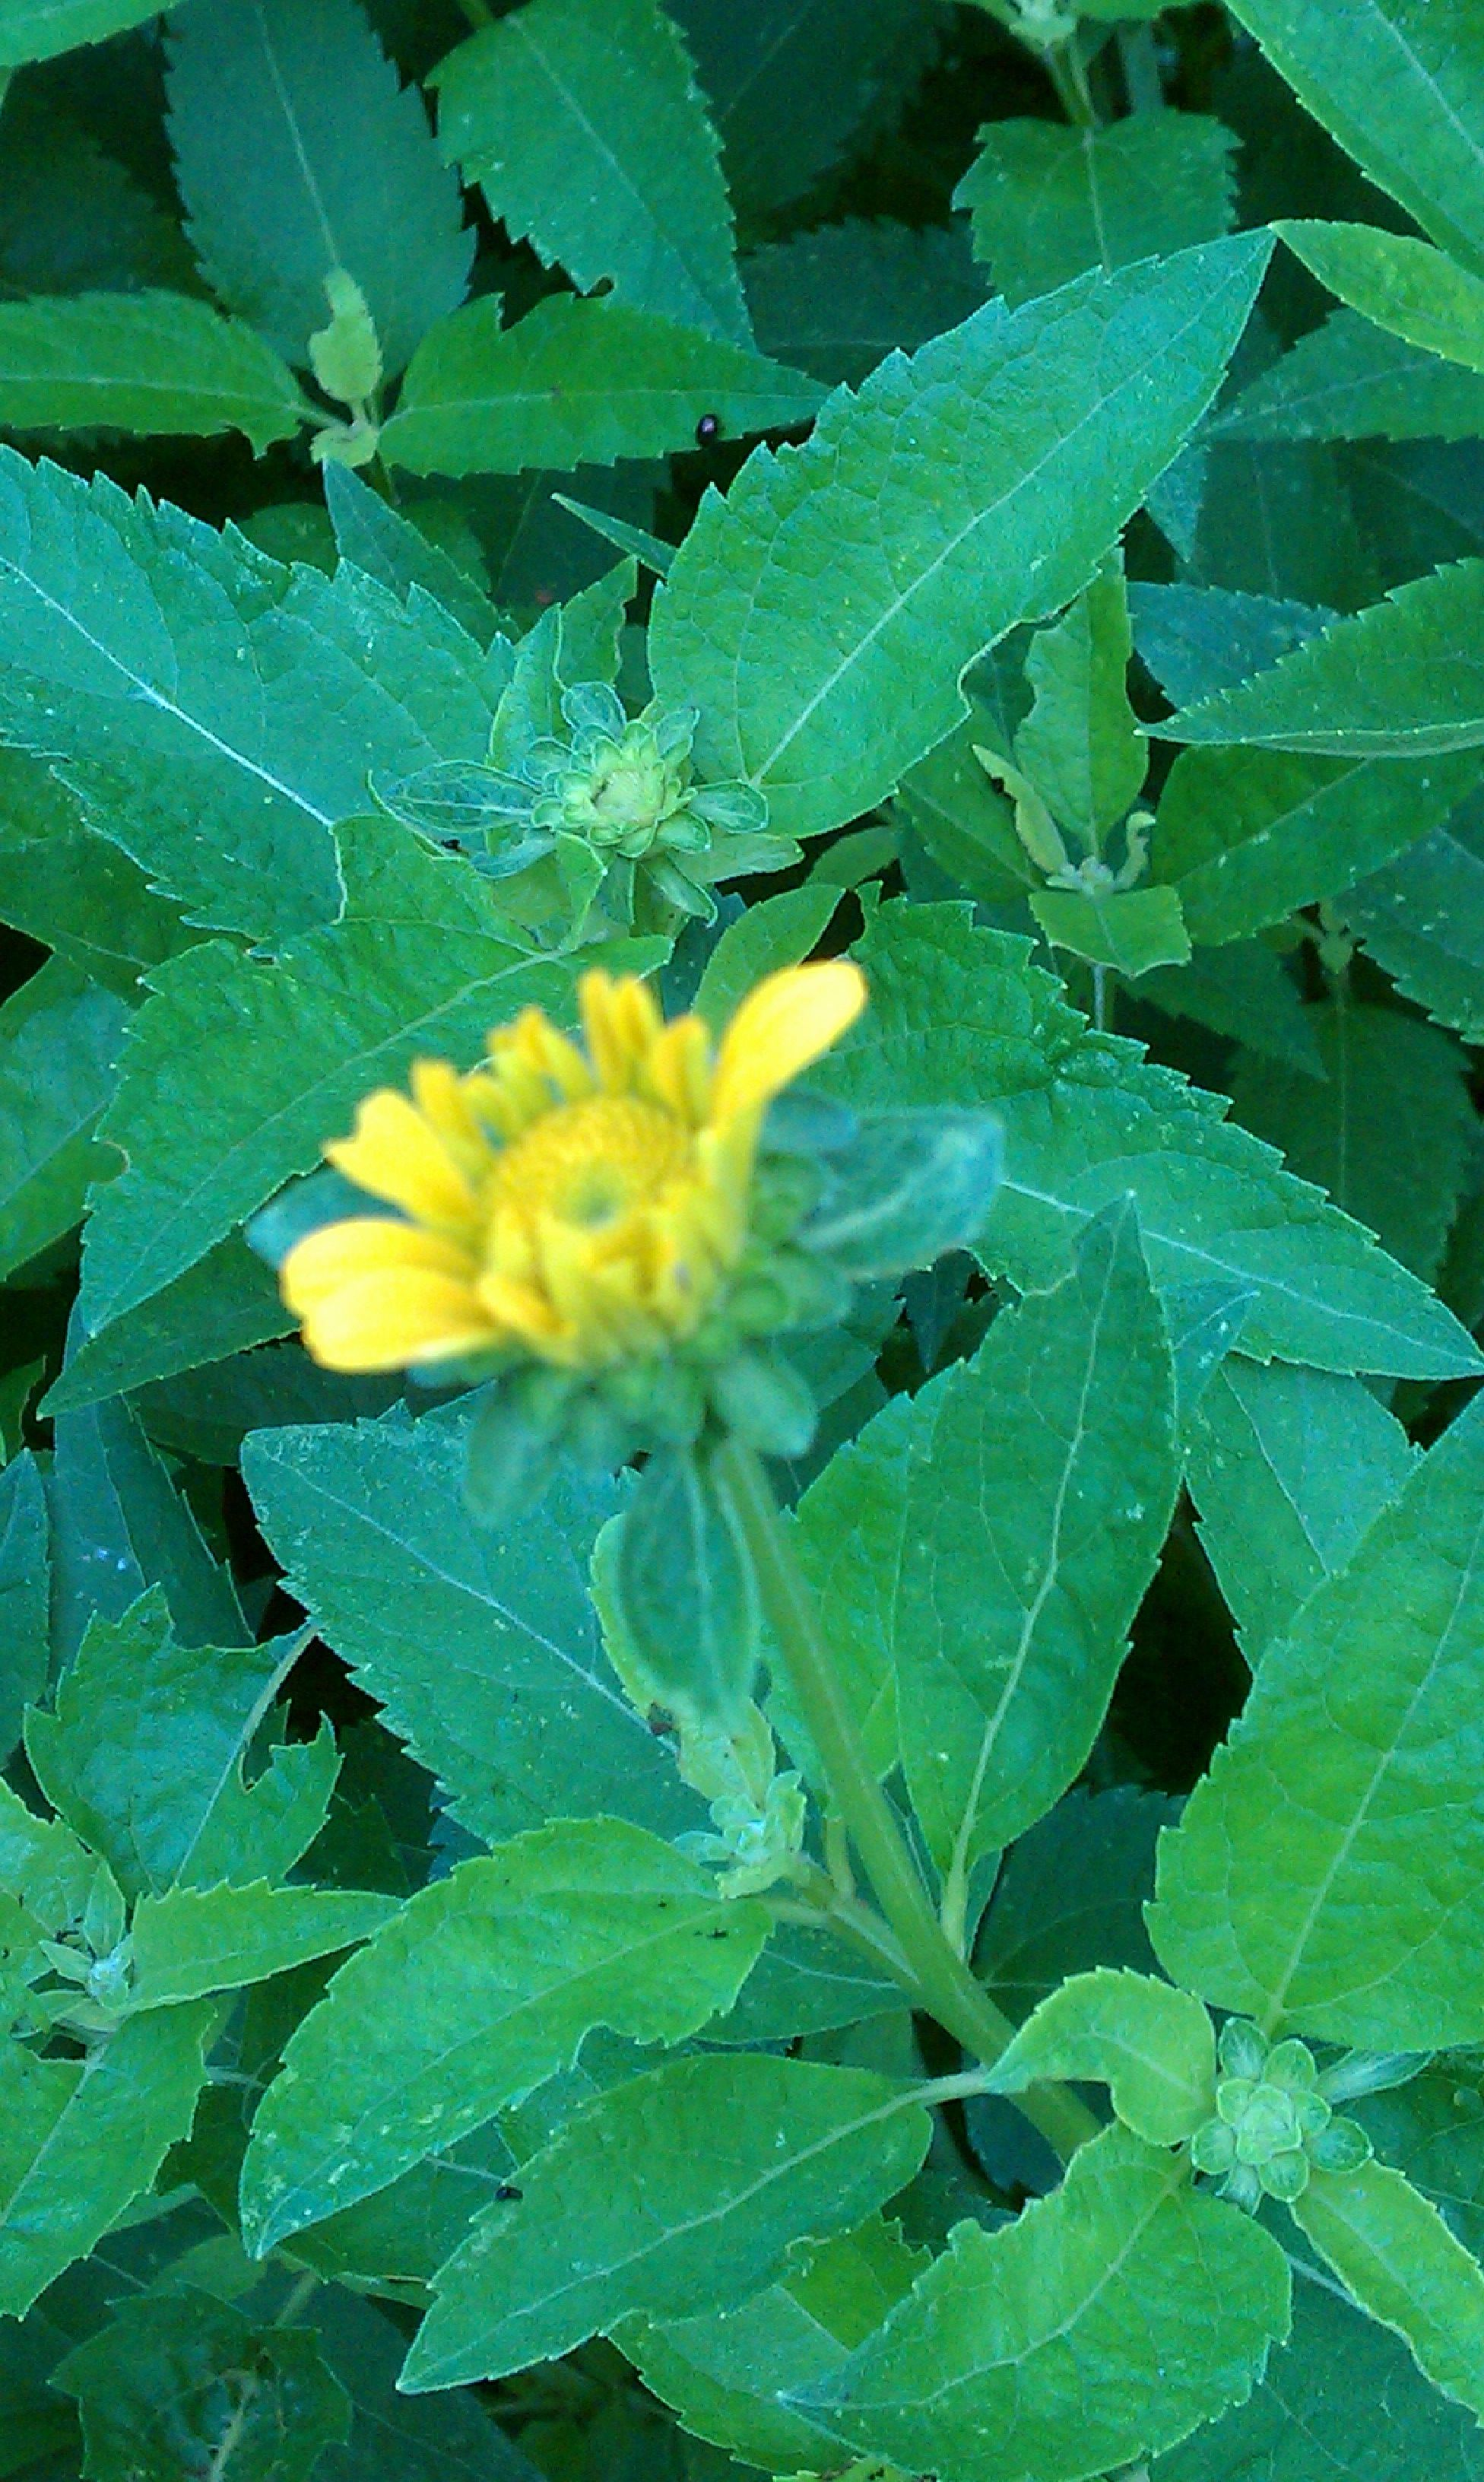 July 12: Heliopsis helianthoides var. scabra 'Summer Sun' (false sunflower) - first bloom